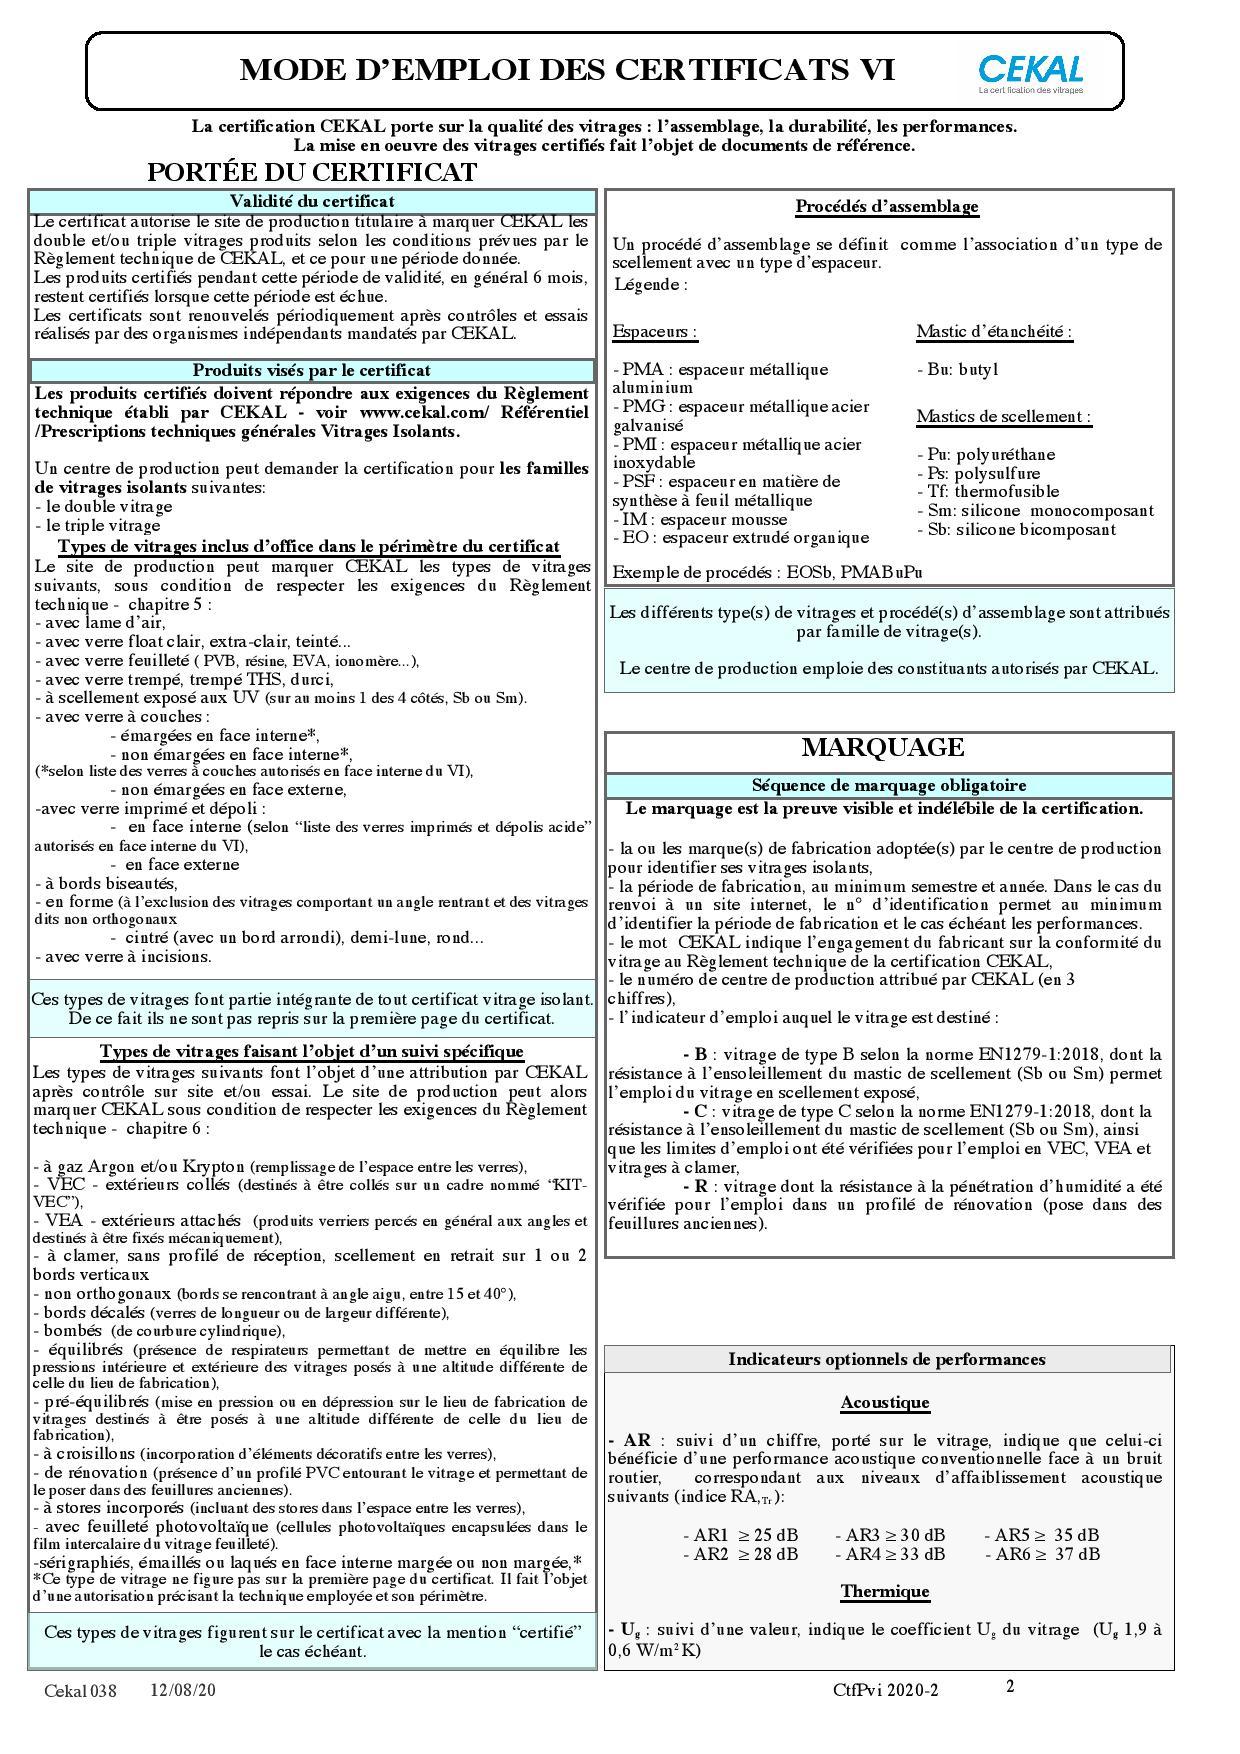 Soverglass CEKAL 2020 S2 (1)-page-002